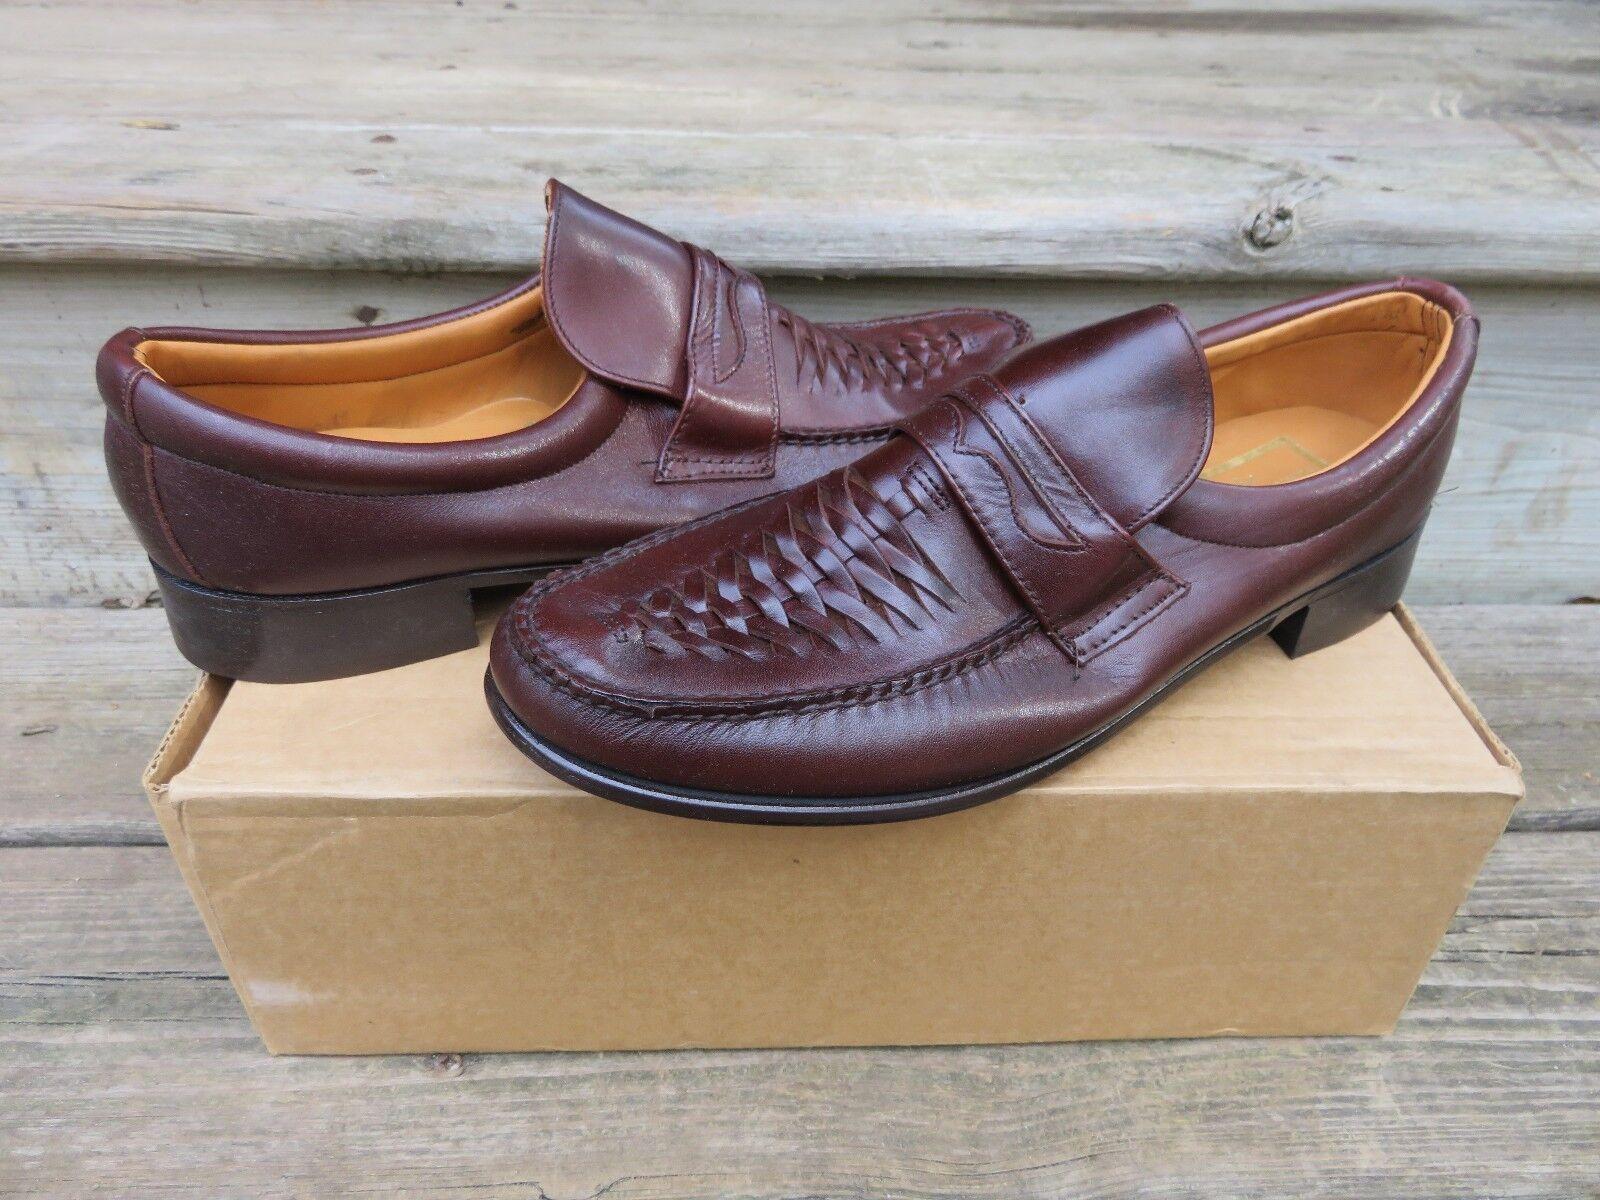 presa di marca NEW Stuart Stuart Stuart McGuire Moccasin Slip-on Penny Loafer Dress scarpe Burgandy Sz.410  il più economico